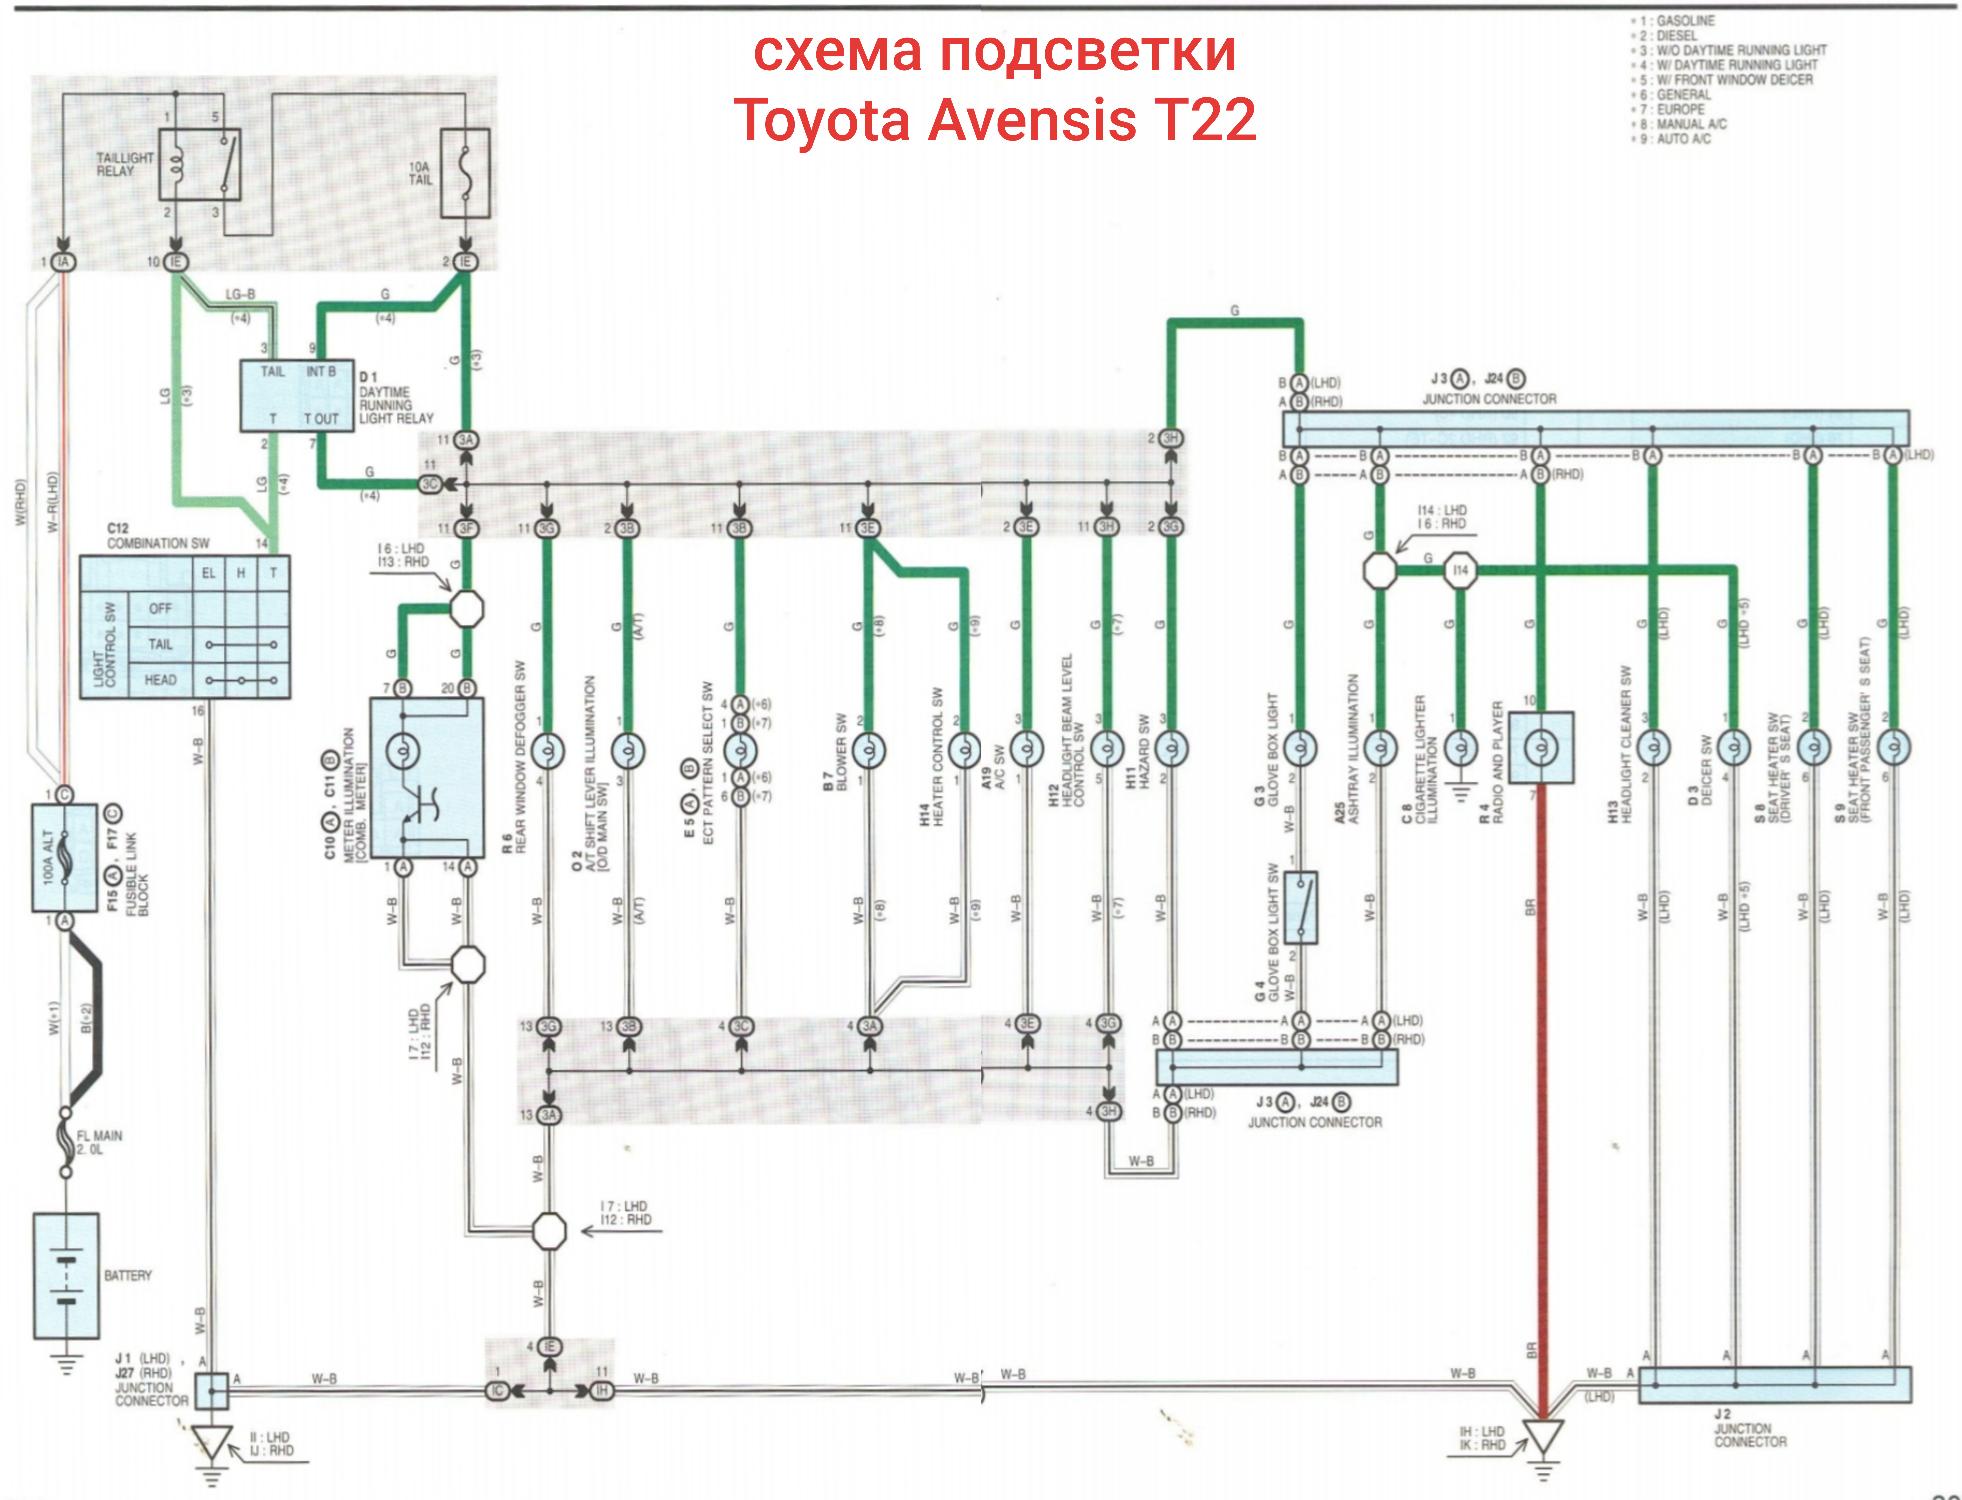 Схема подсветки приборов Авенсис